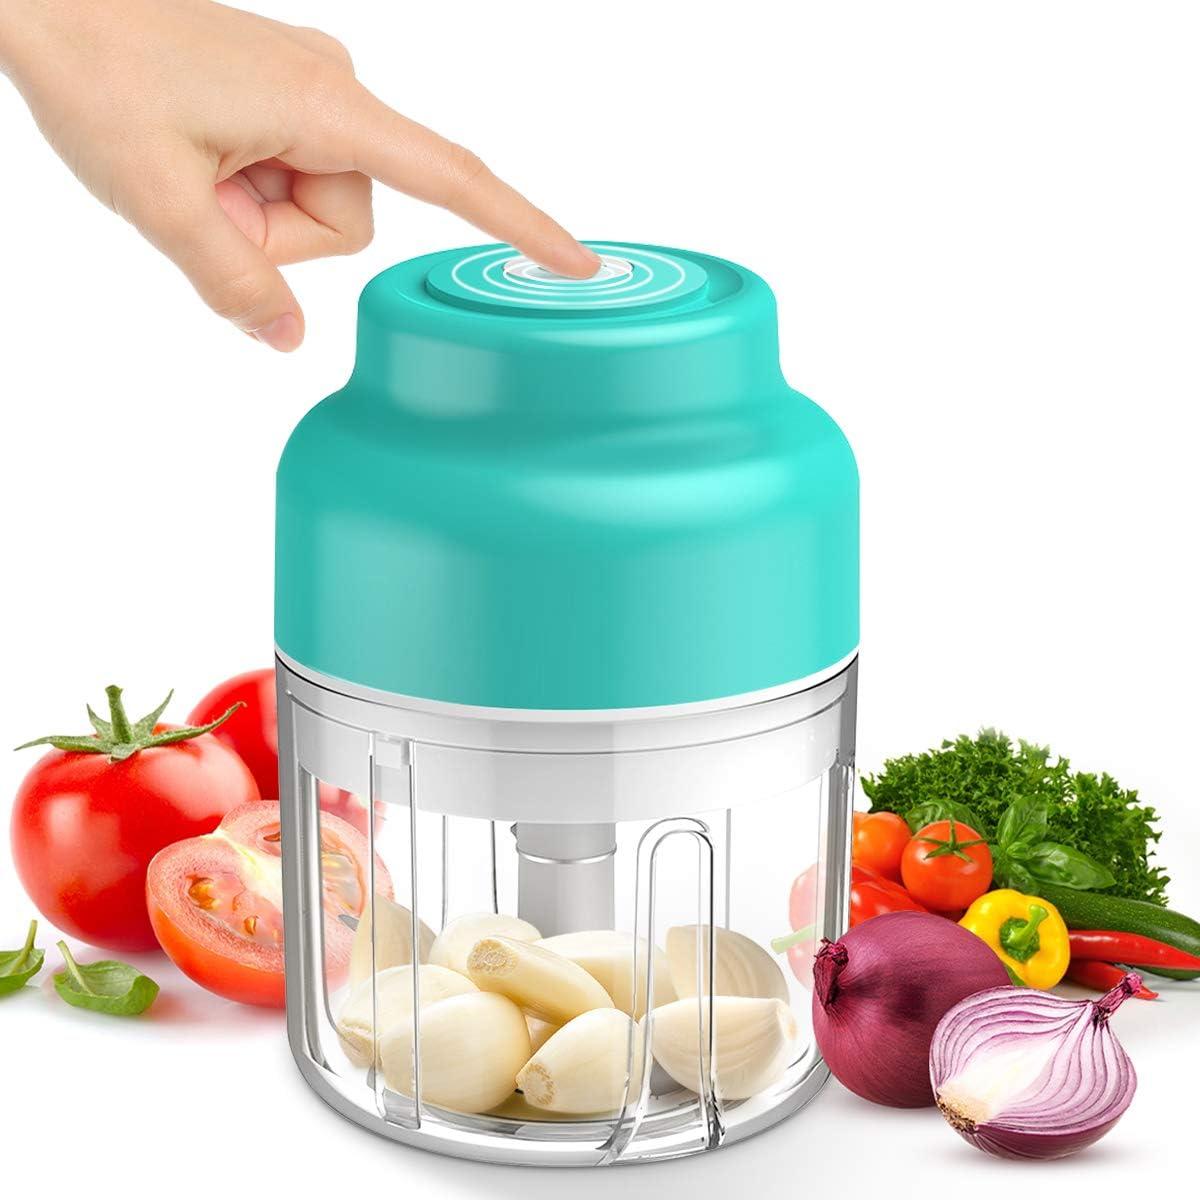 Mini Electric Food Chopper, 250ml Hand-Powered Onion Garlic Chopper Mincer, Portable Processor for Vegetable/Spices/Seasoning/Baby Food